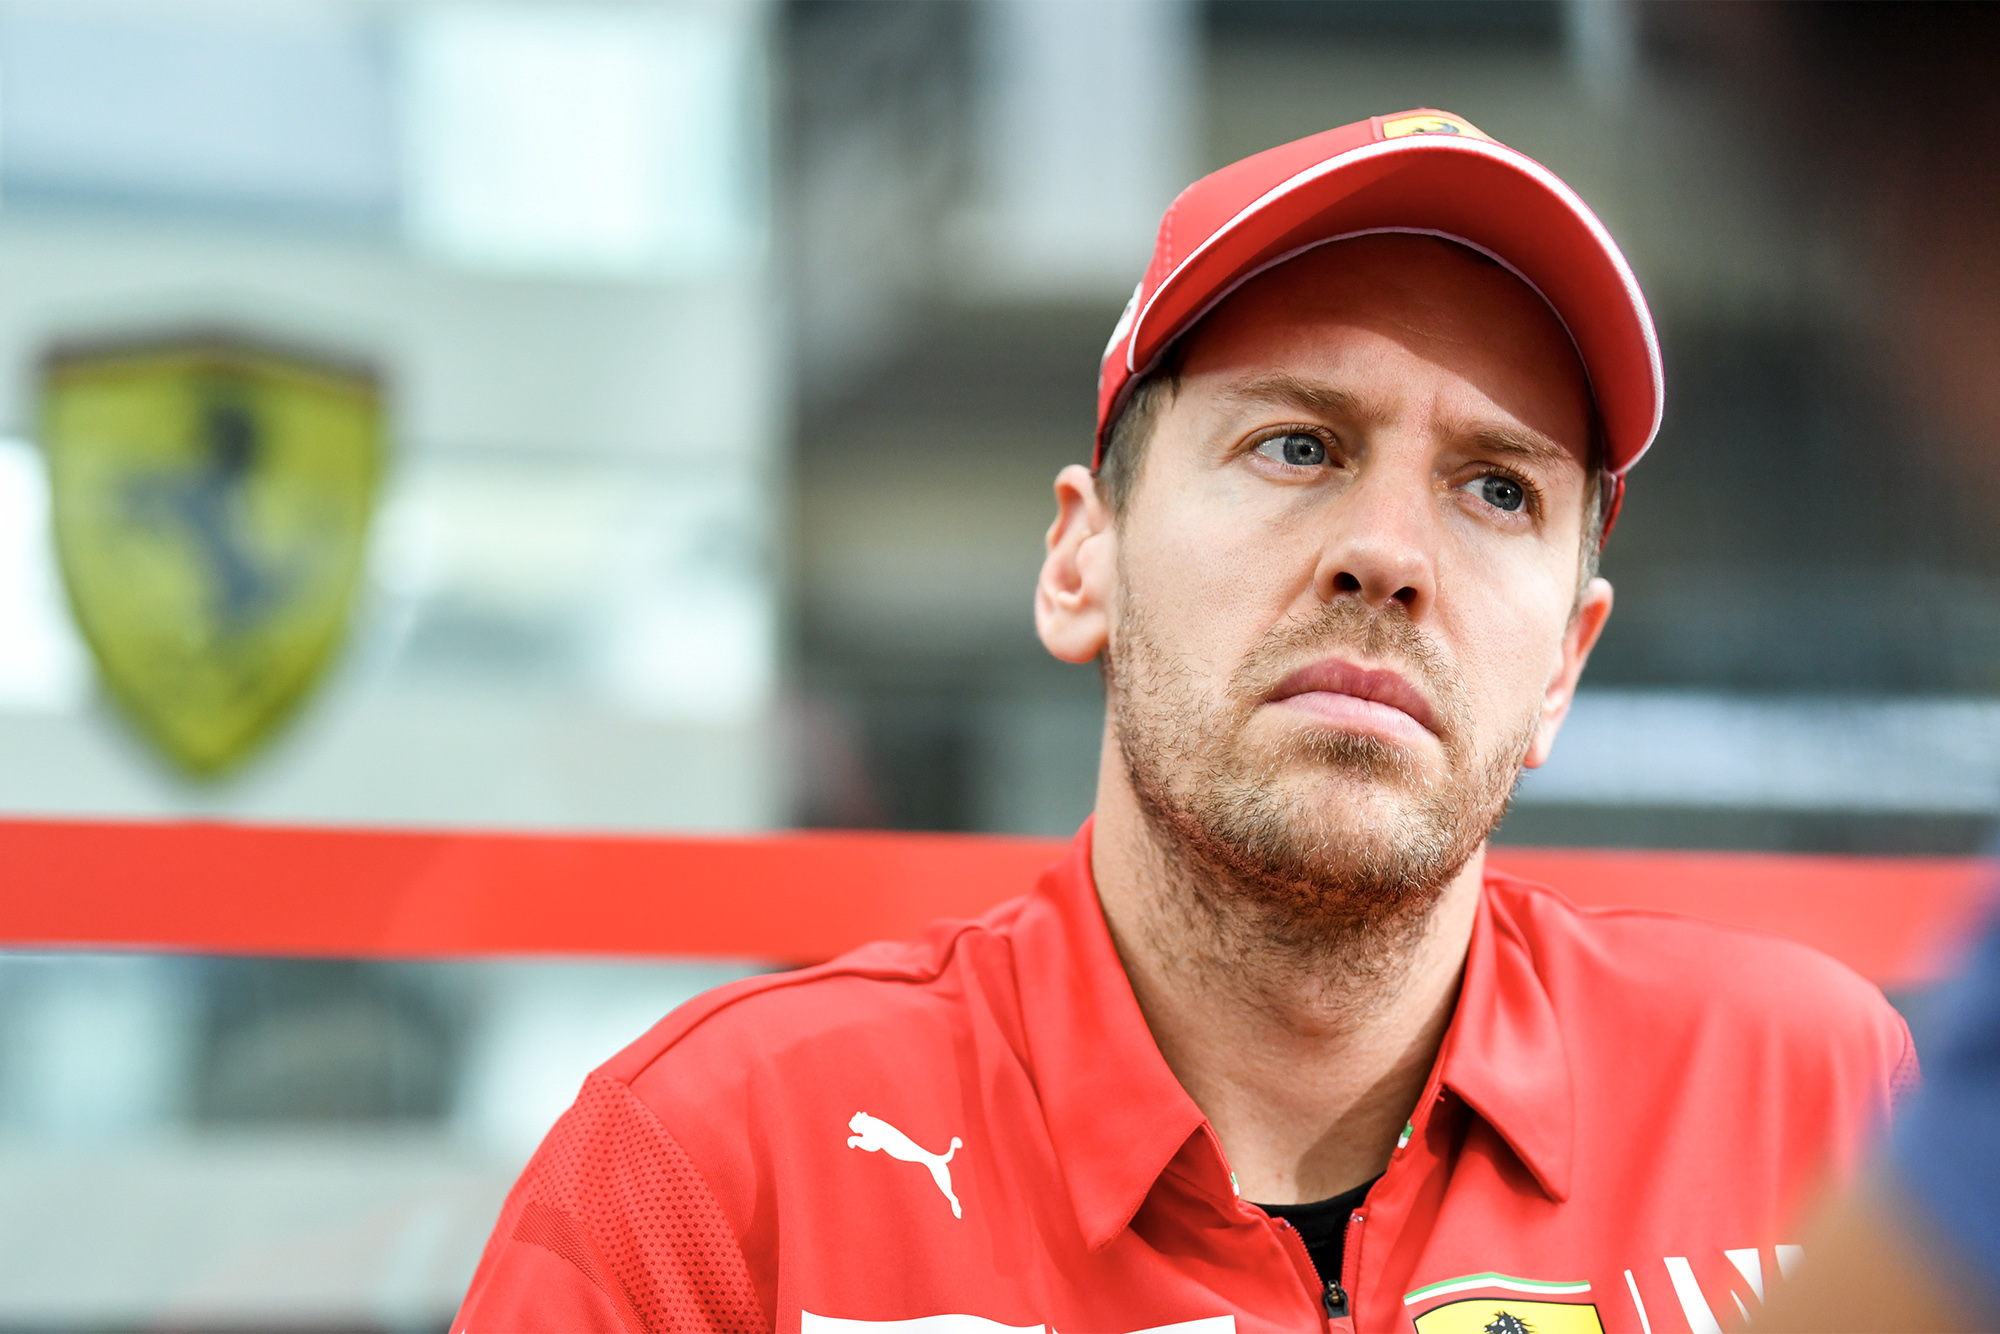 Sebastian Vettel during the 2019 Formula 1 season